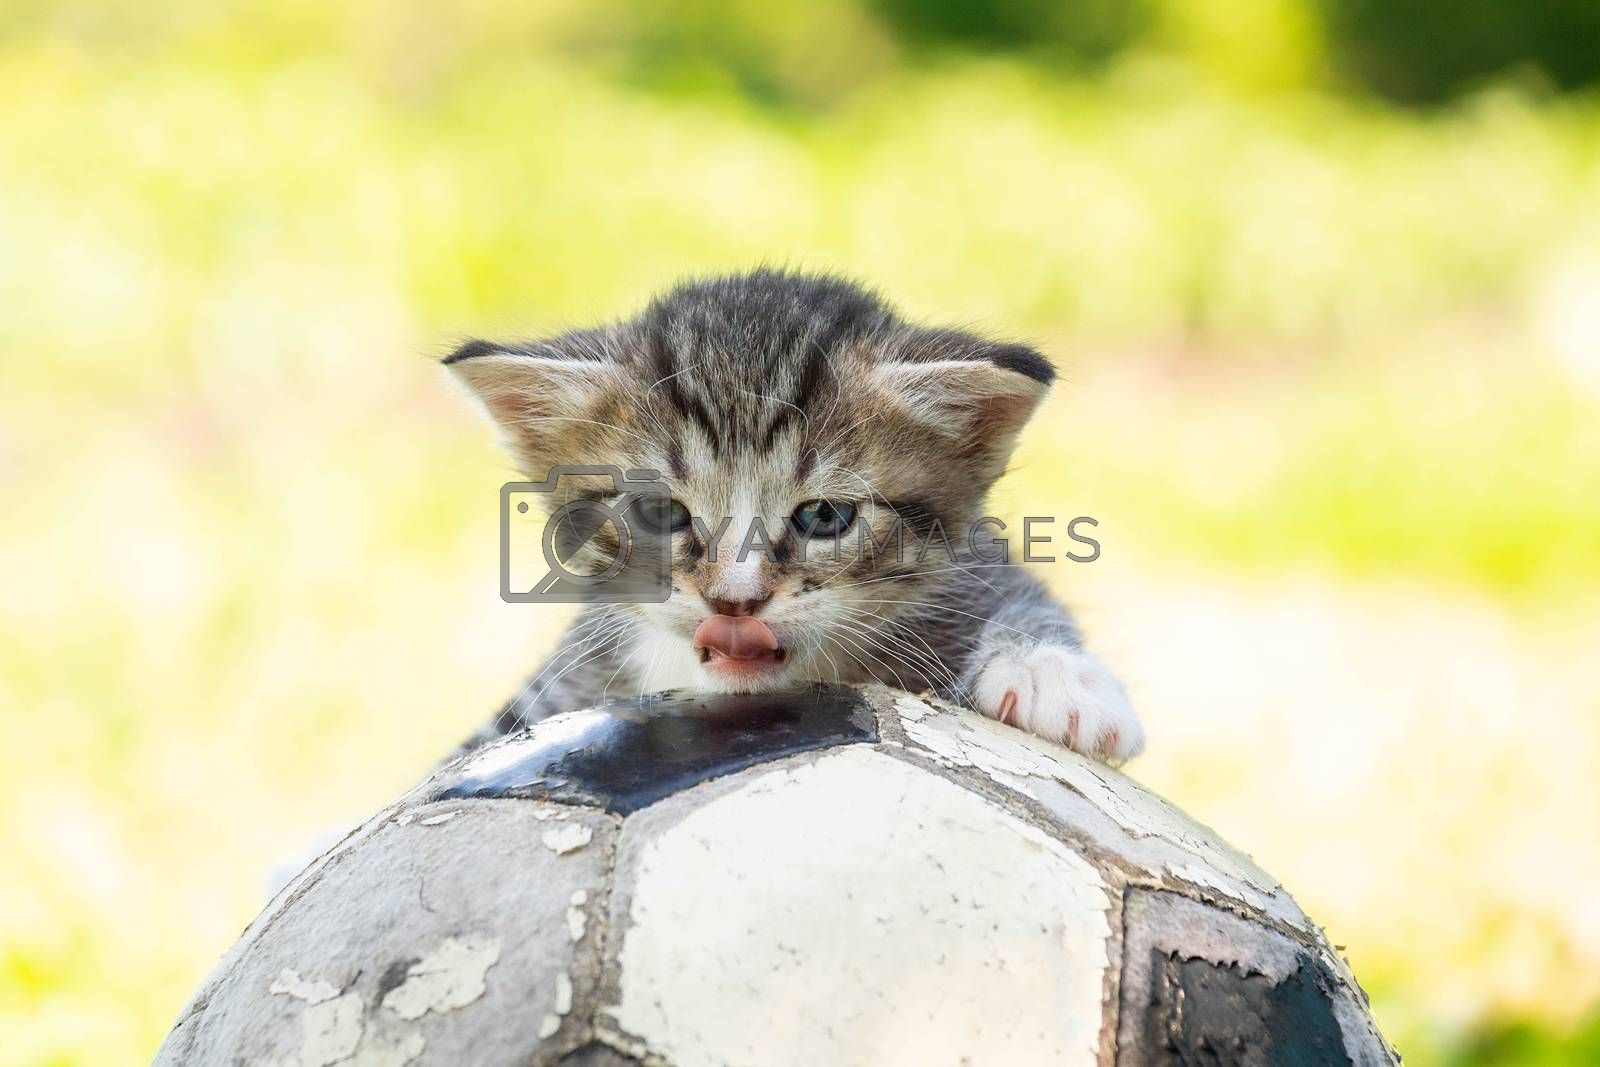 Little kitten on an old football ball